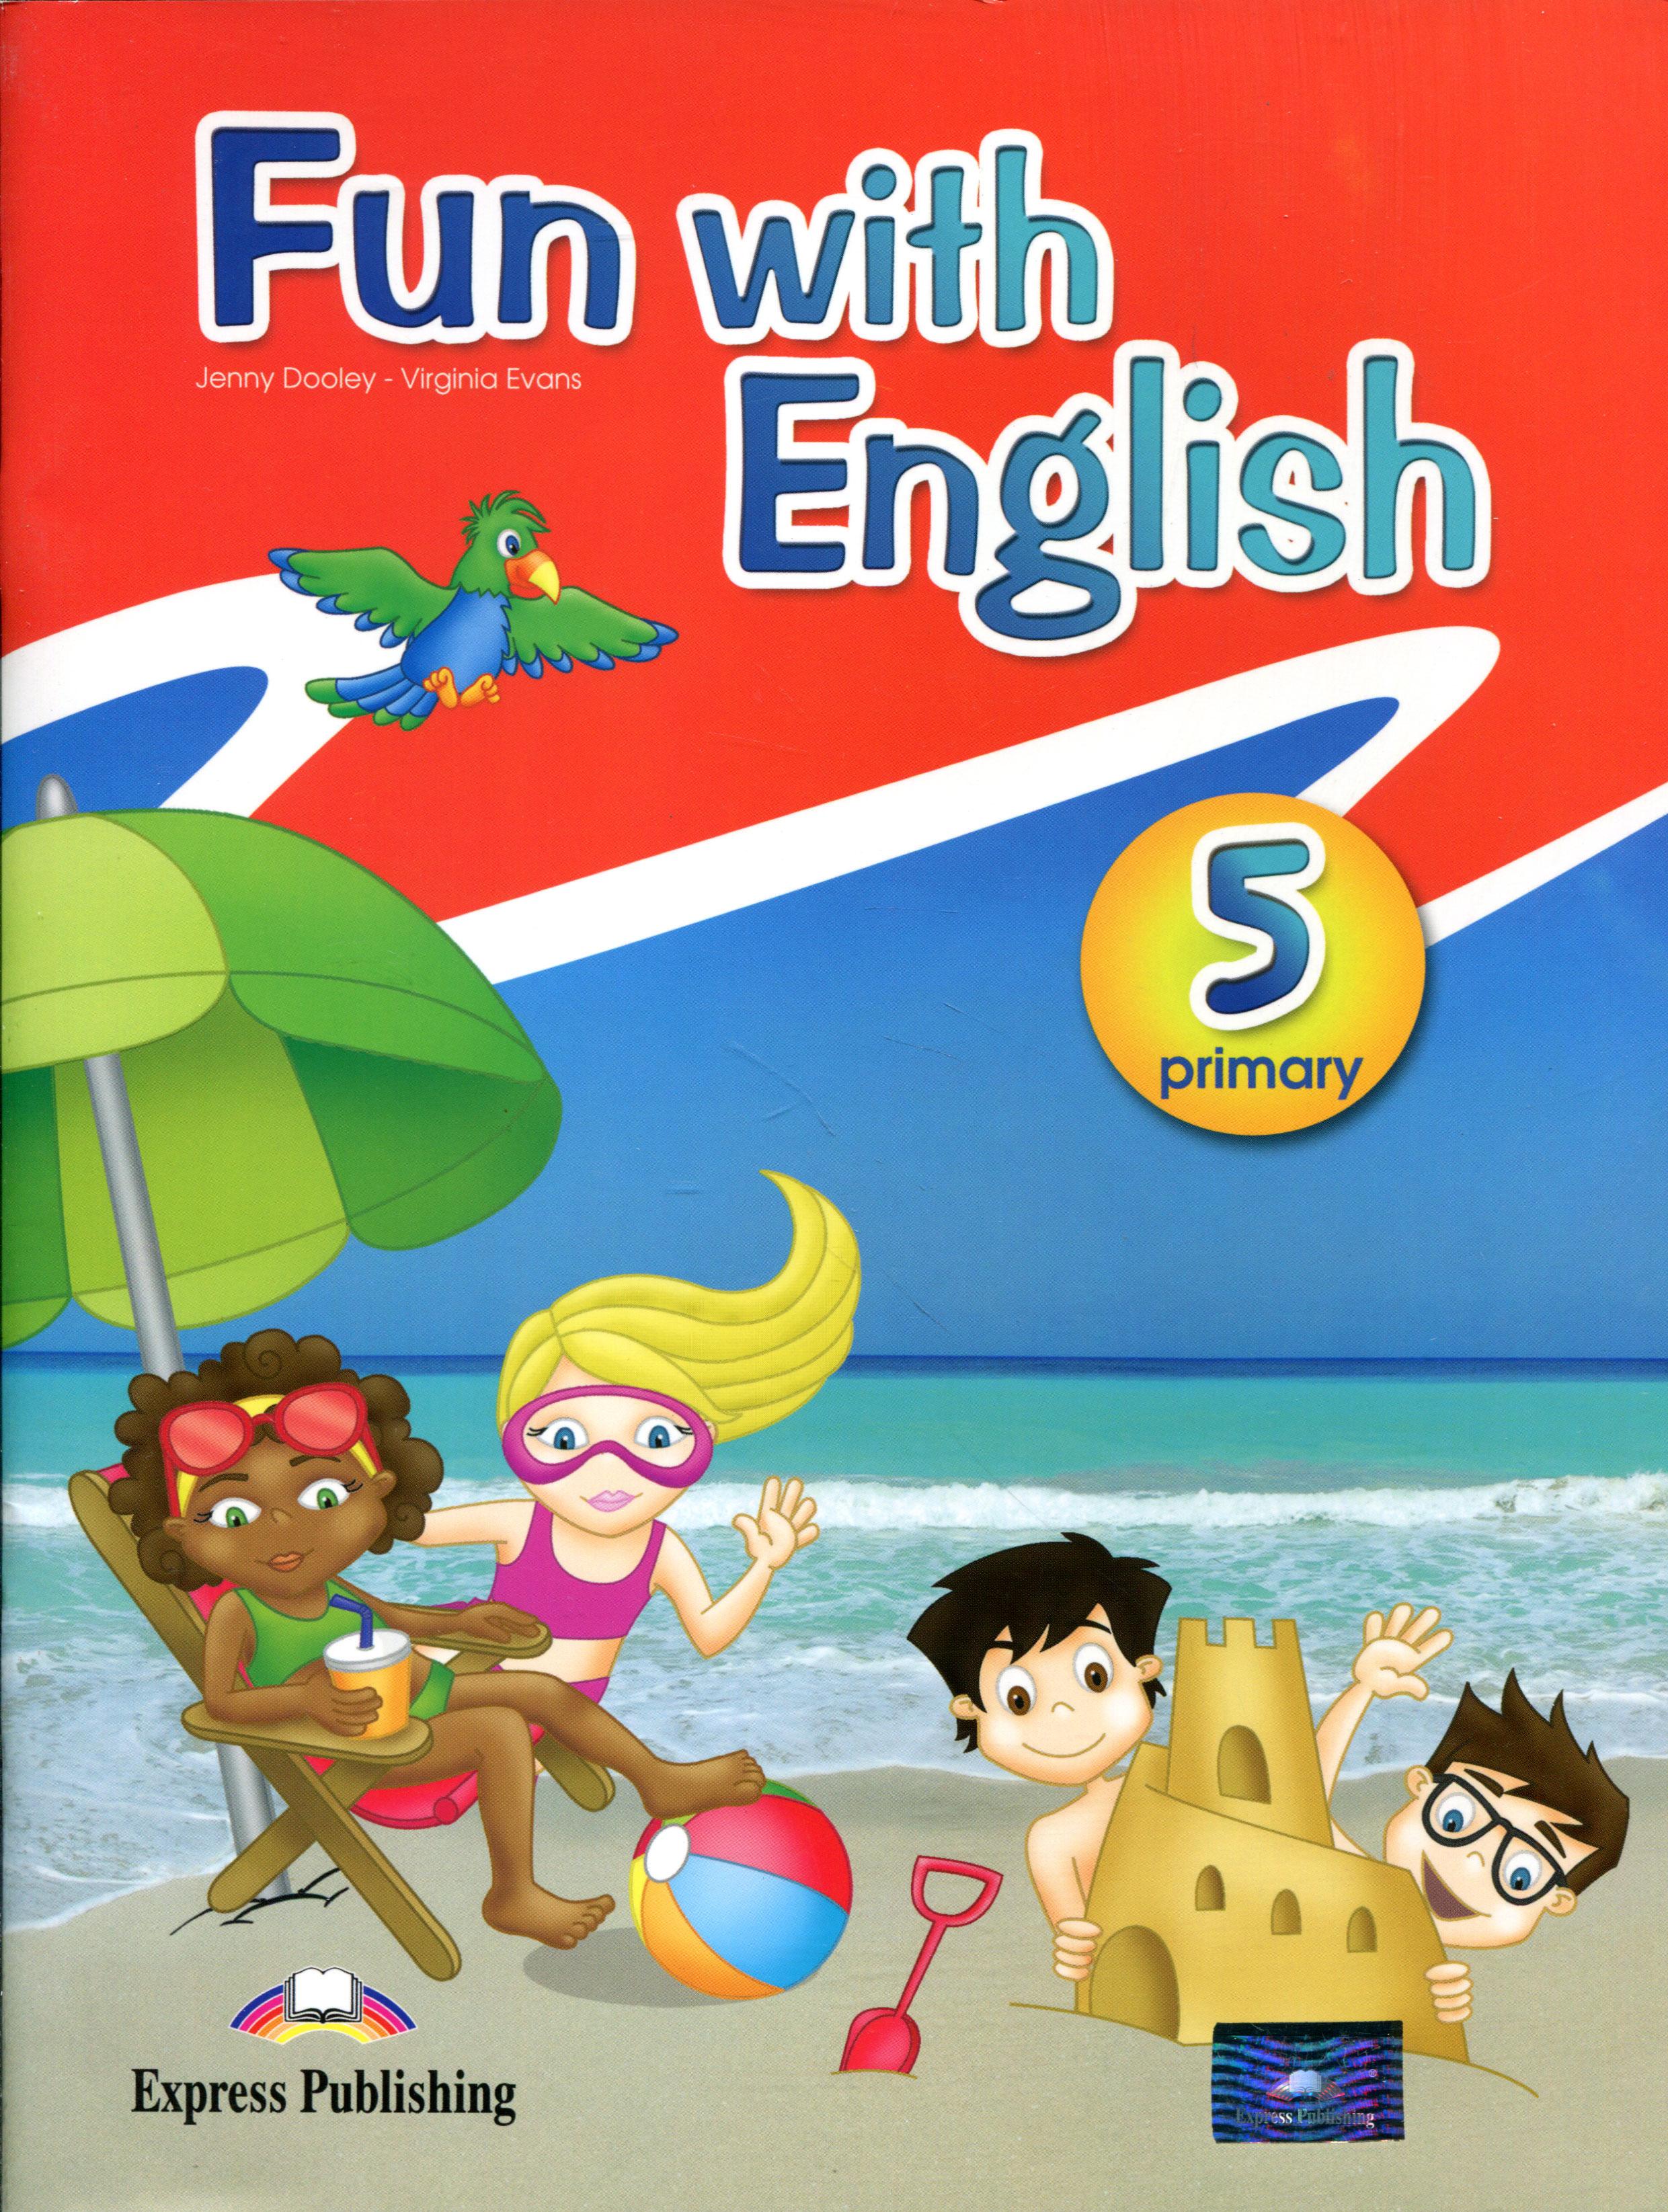 Fun with English: Primary 5